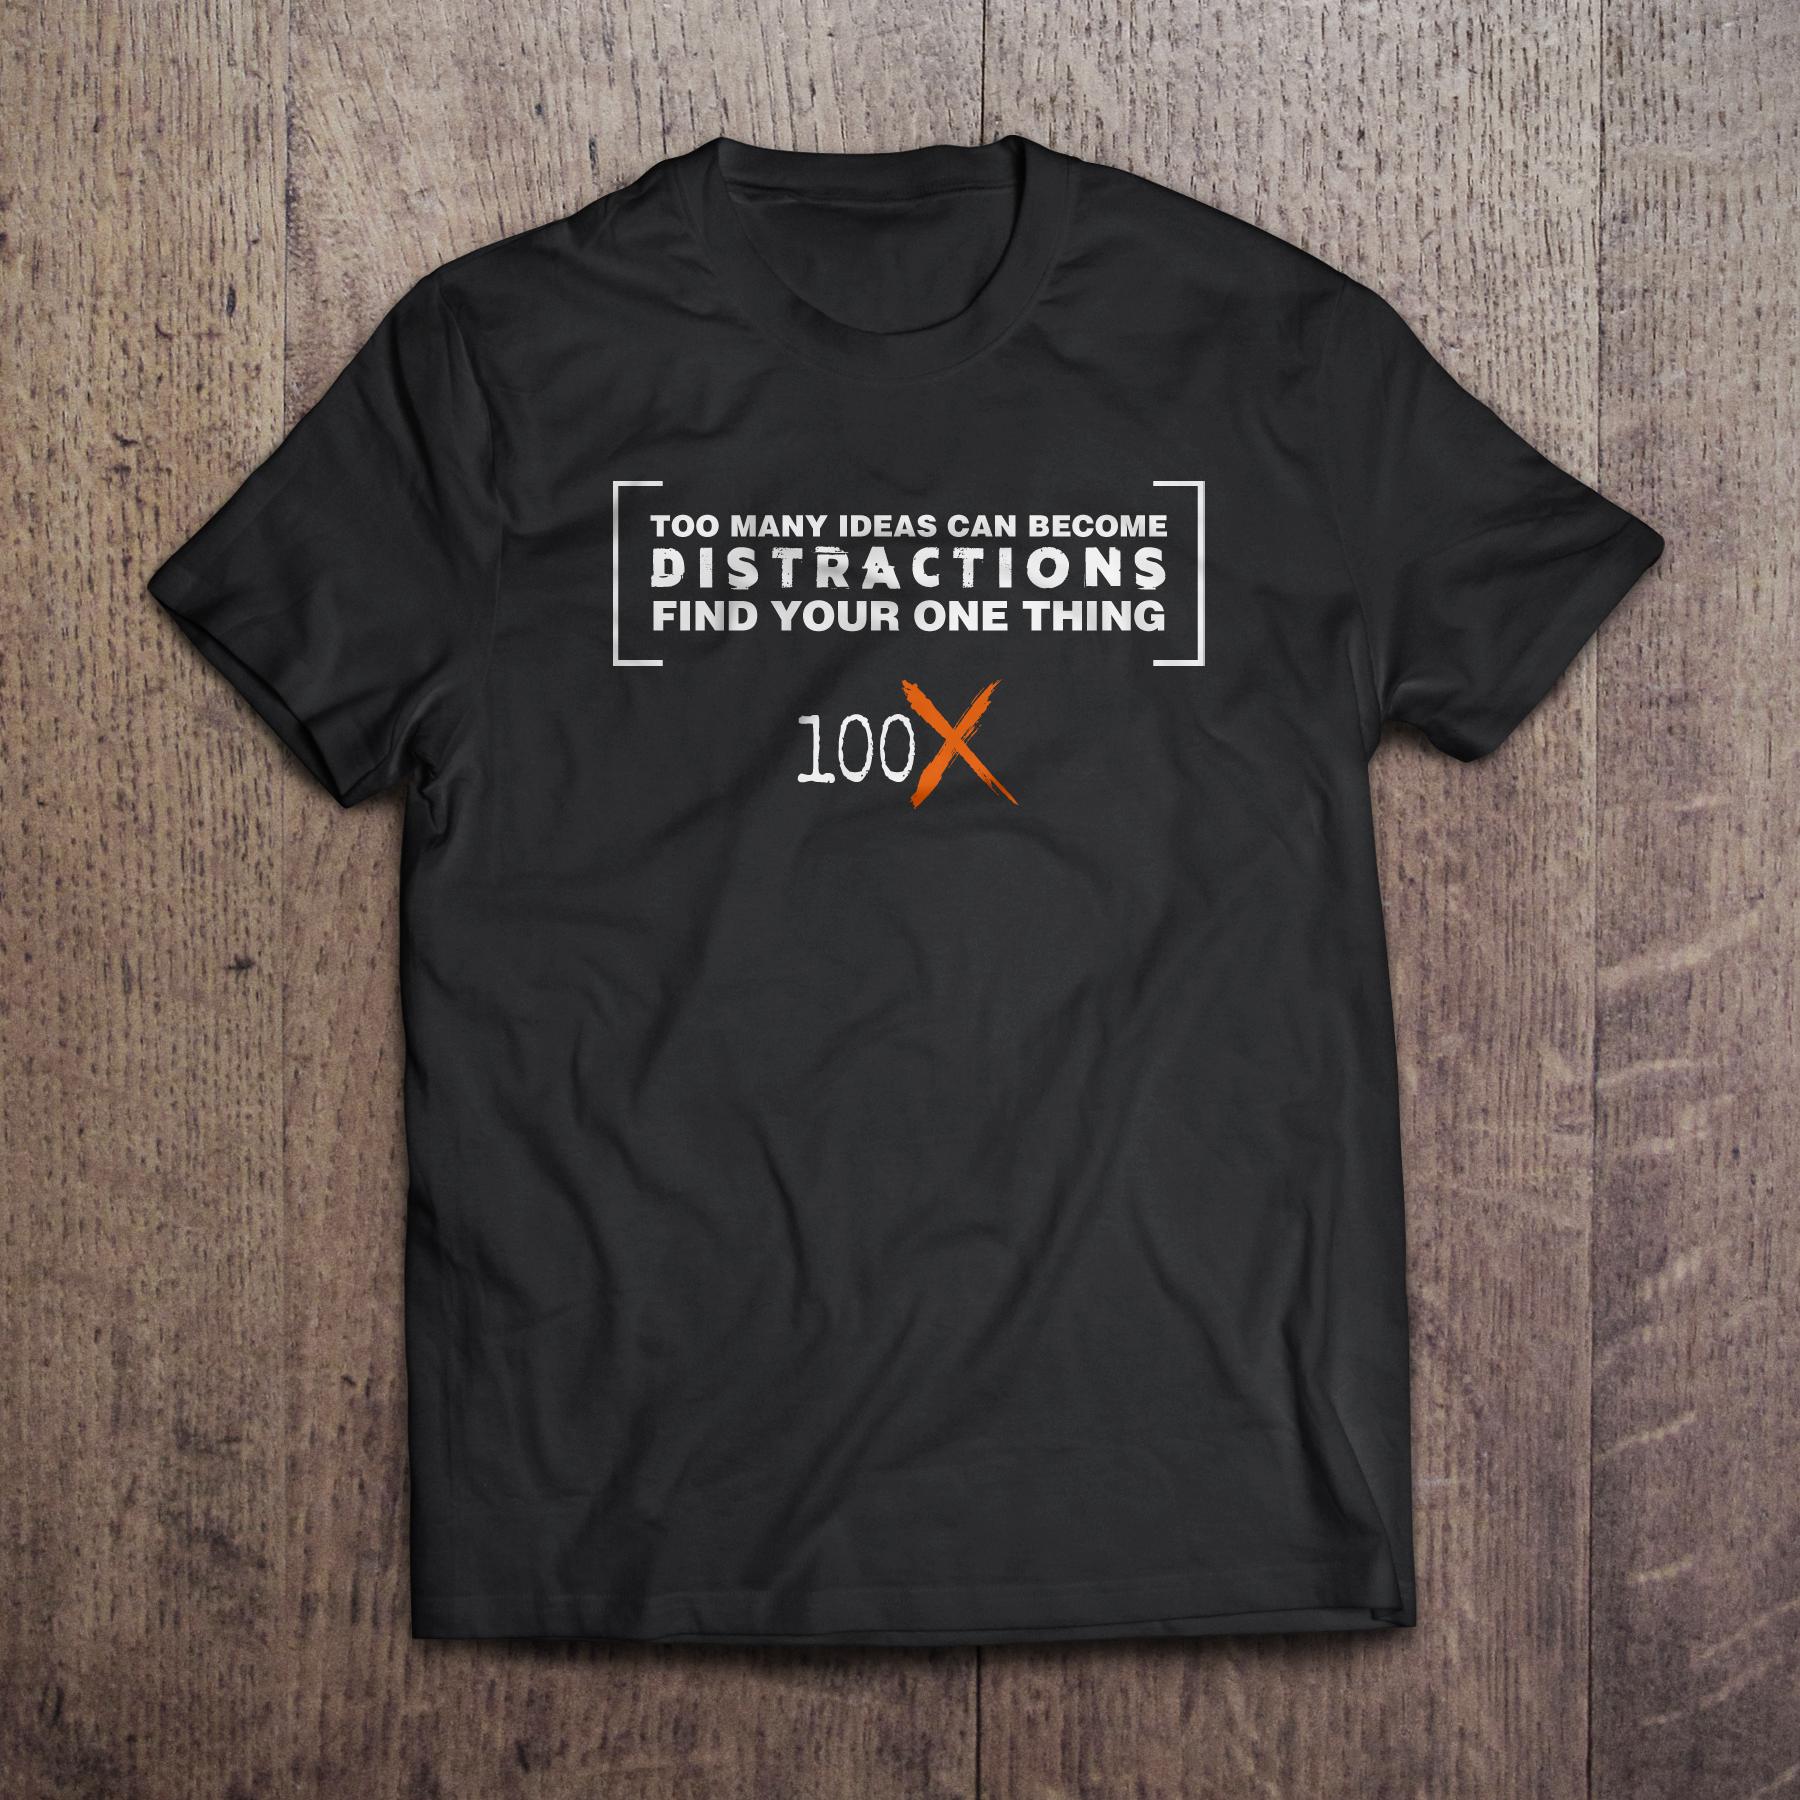 100X_Tee Distract W.png